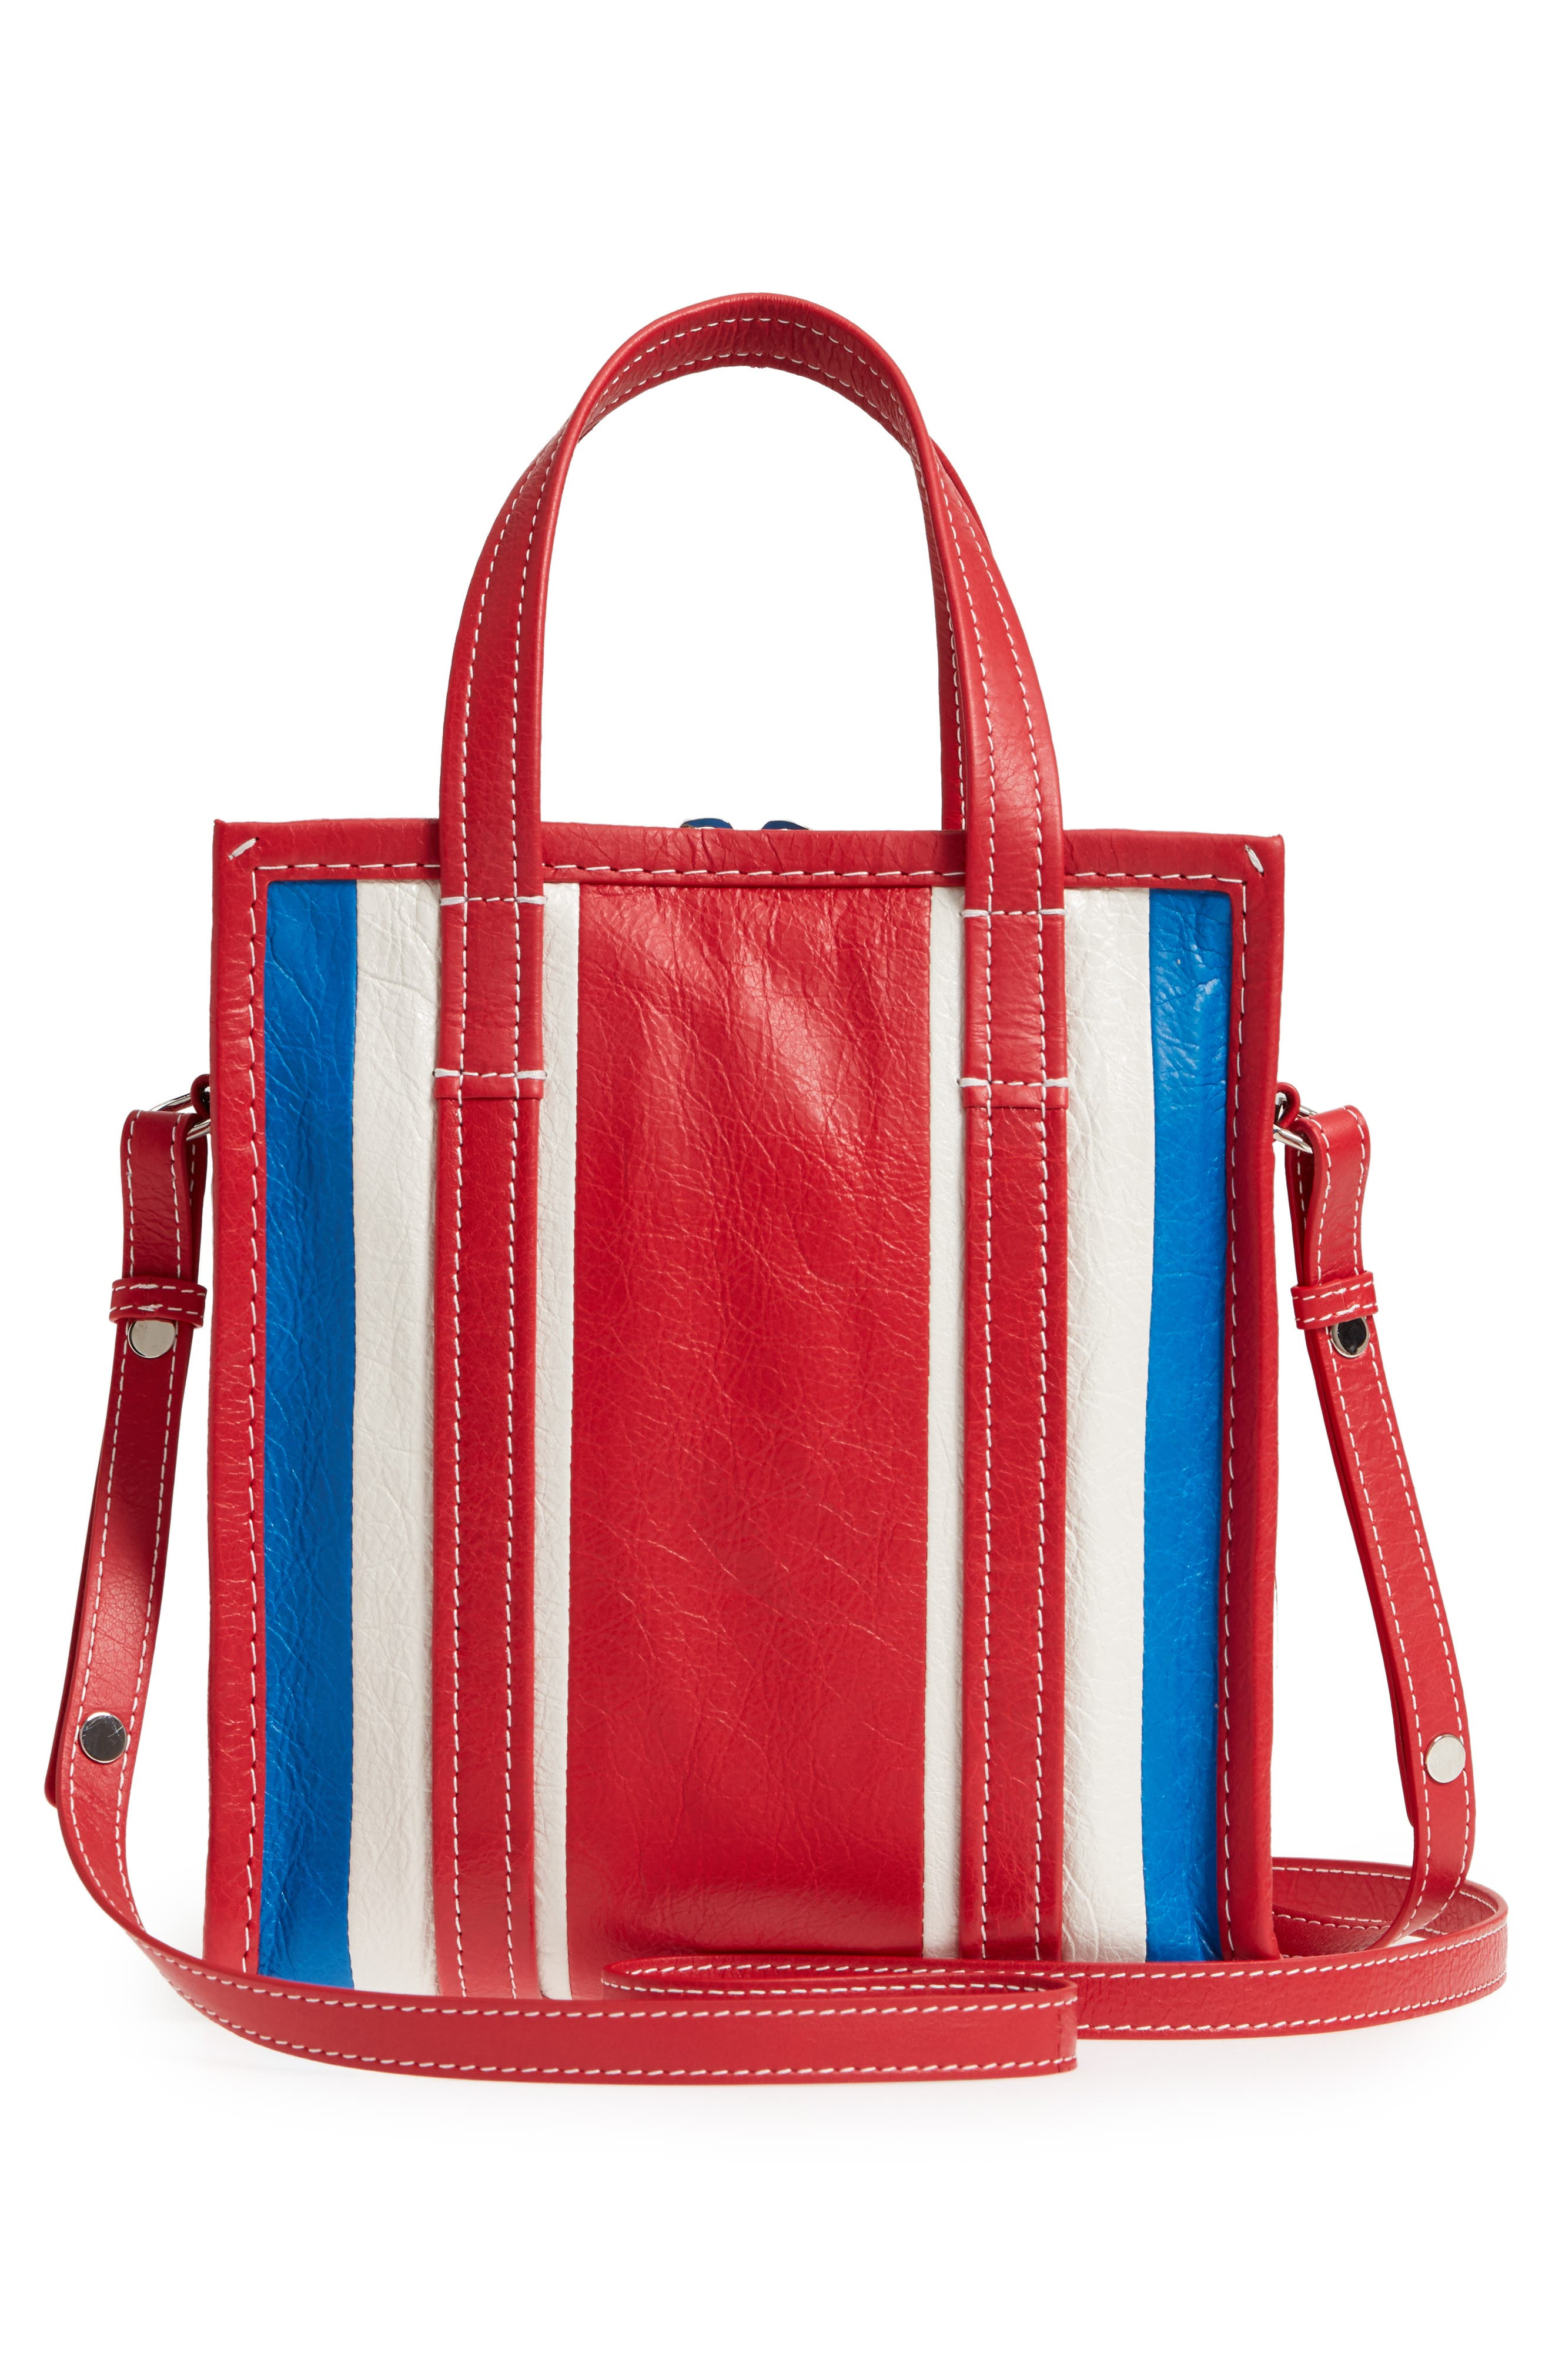 Extra Small Bazar Leather AJ Shopper,                             Alternate thumbnail 3, color,                             BLUE/ BLANC/ ROUGE